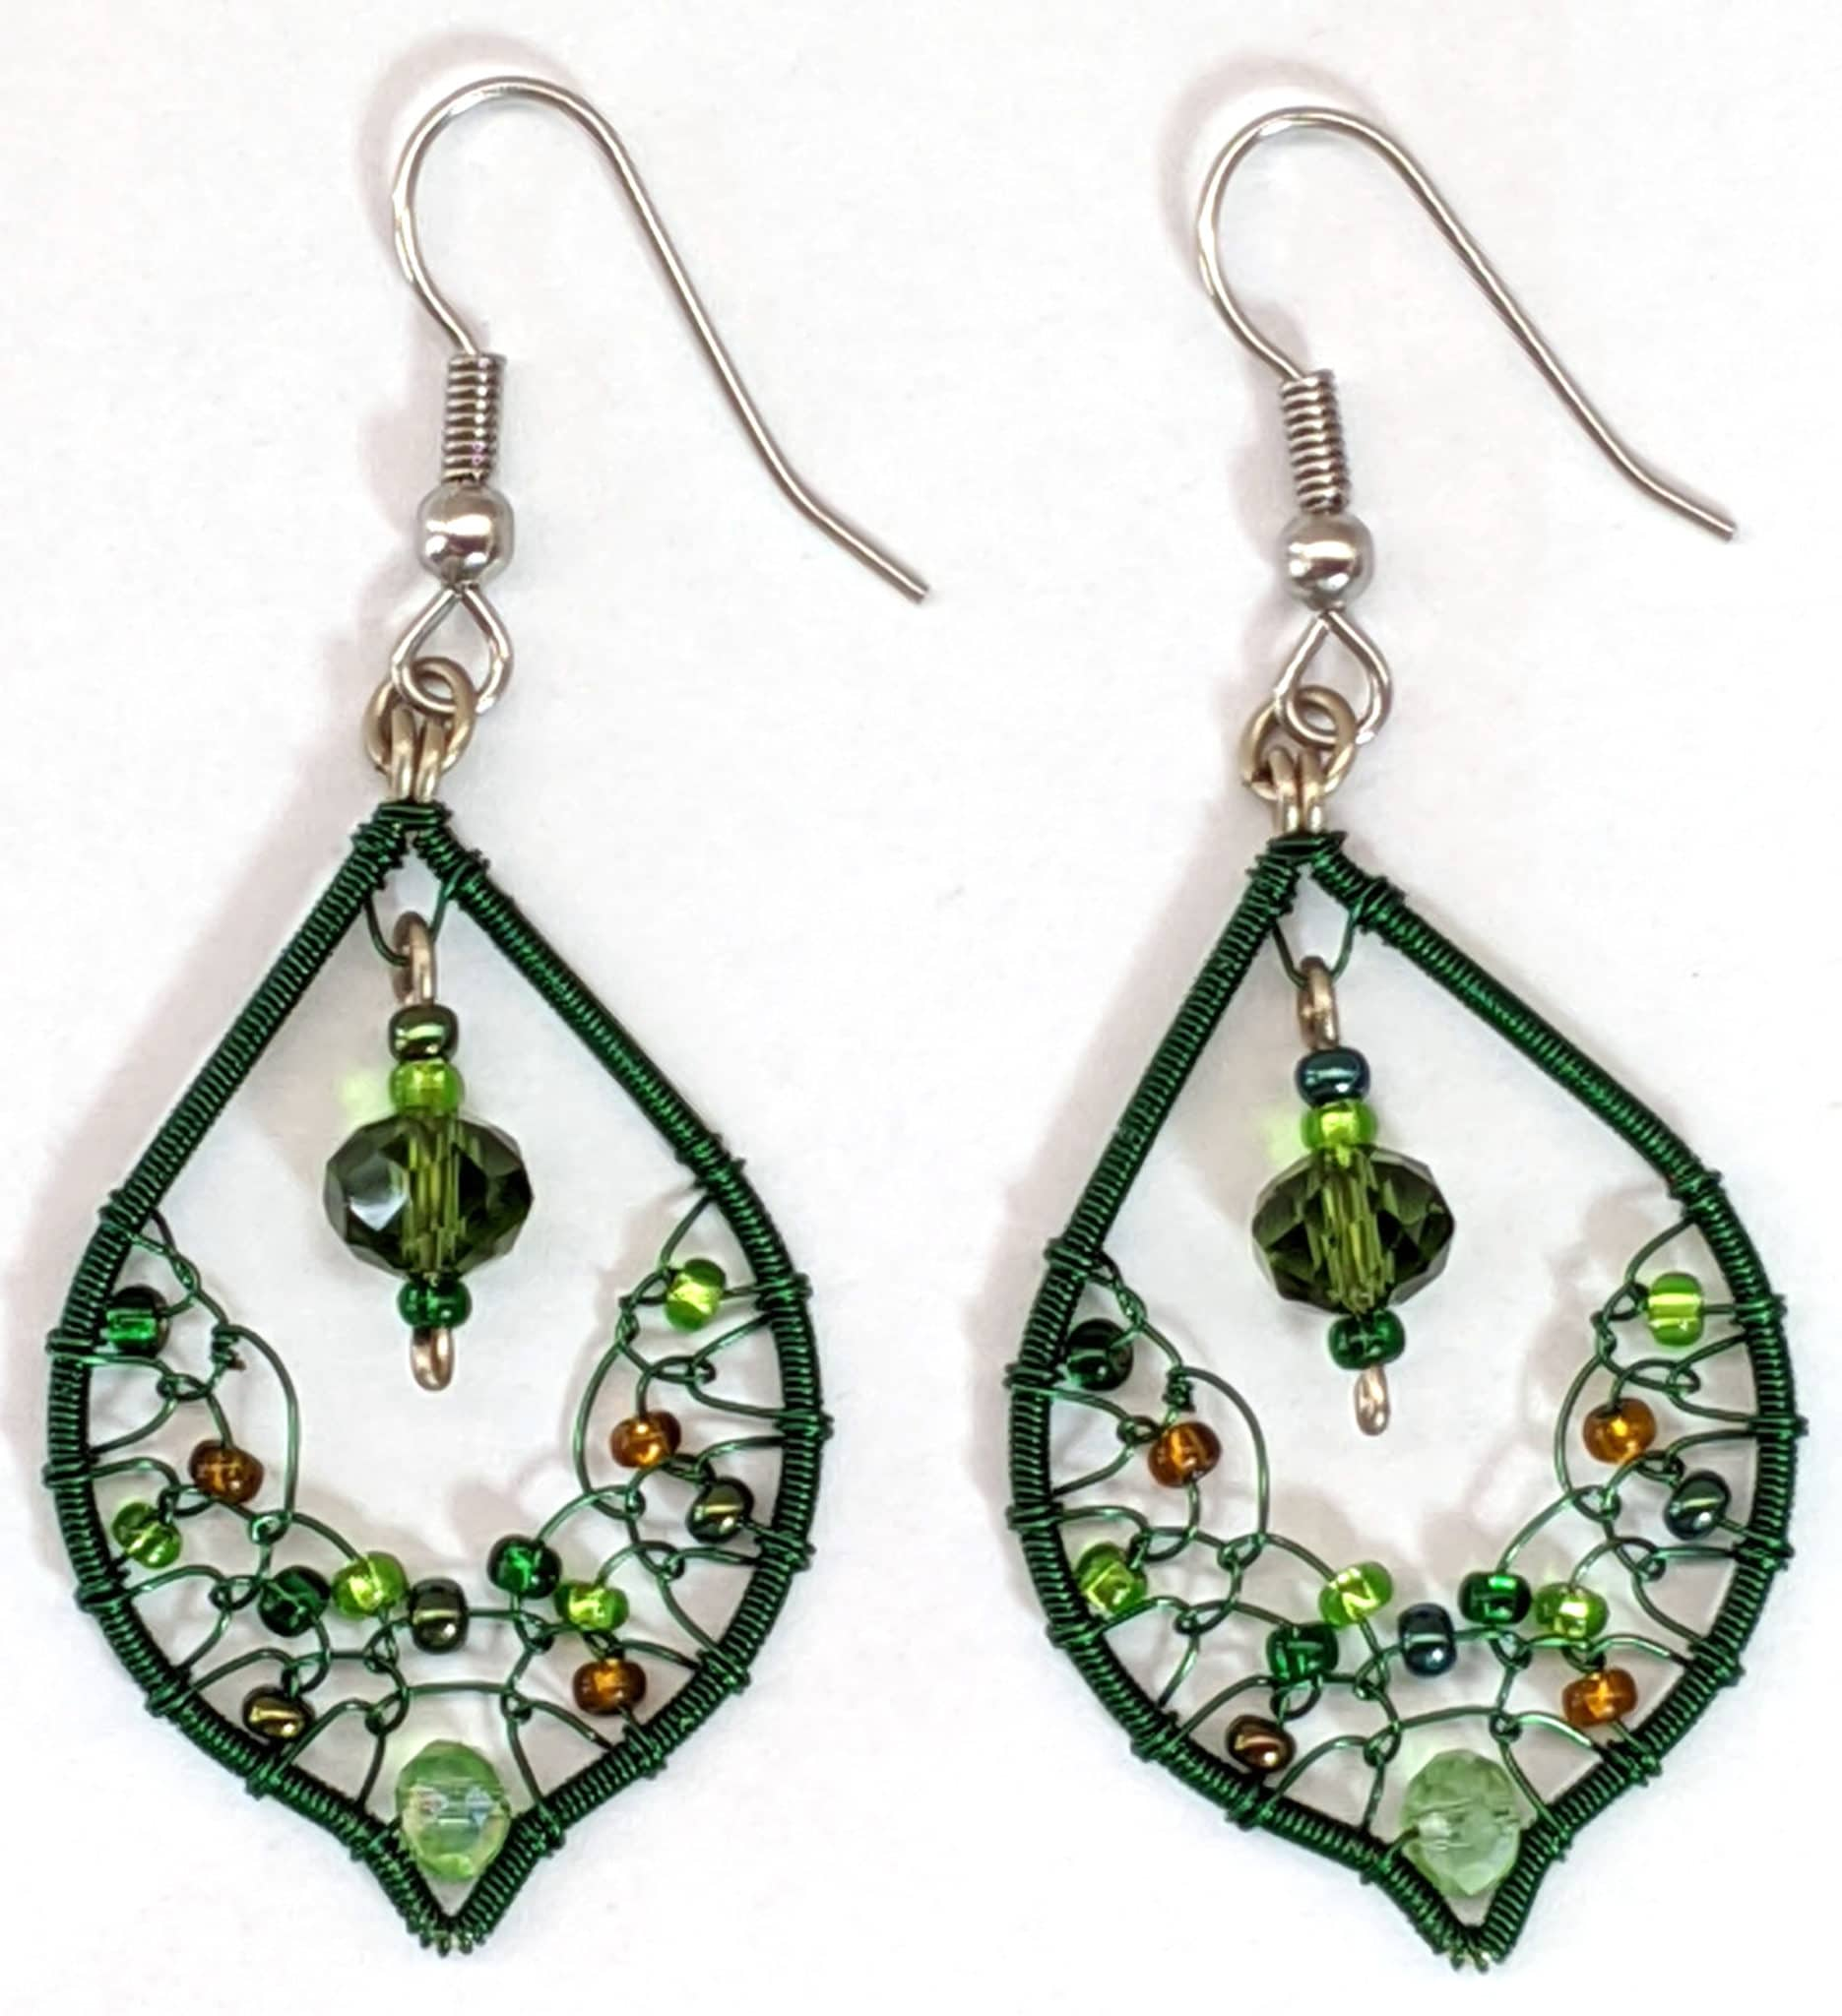 Arabian Nights Earrings - Greens